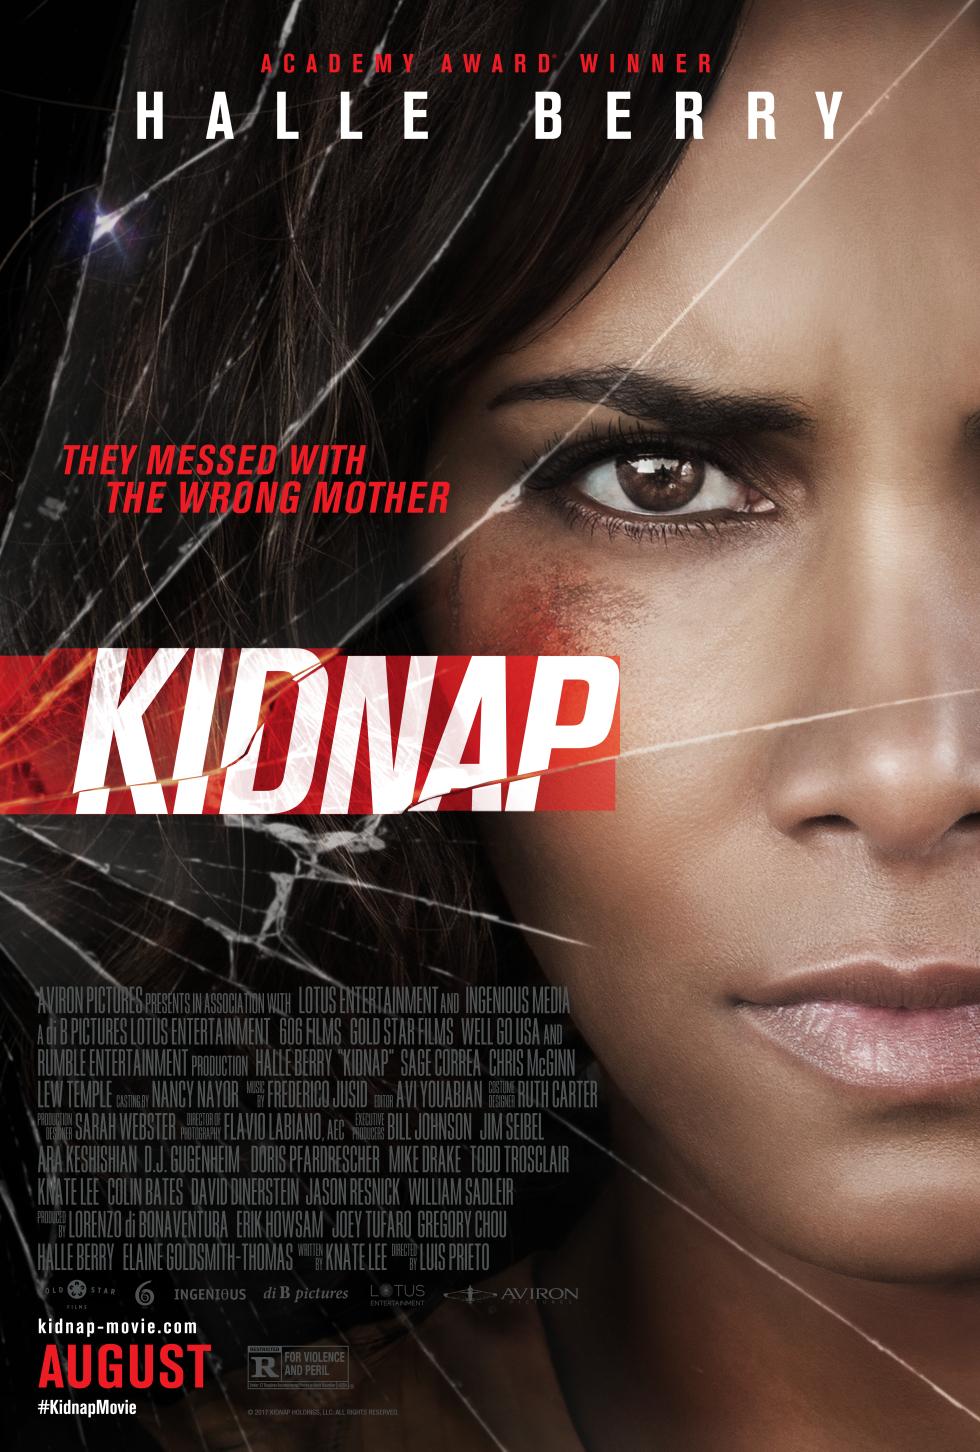 Capa Kidnap Torrent Dublado 720p 1080p 5.1 Baixar